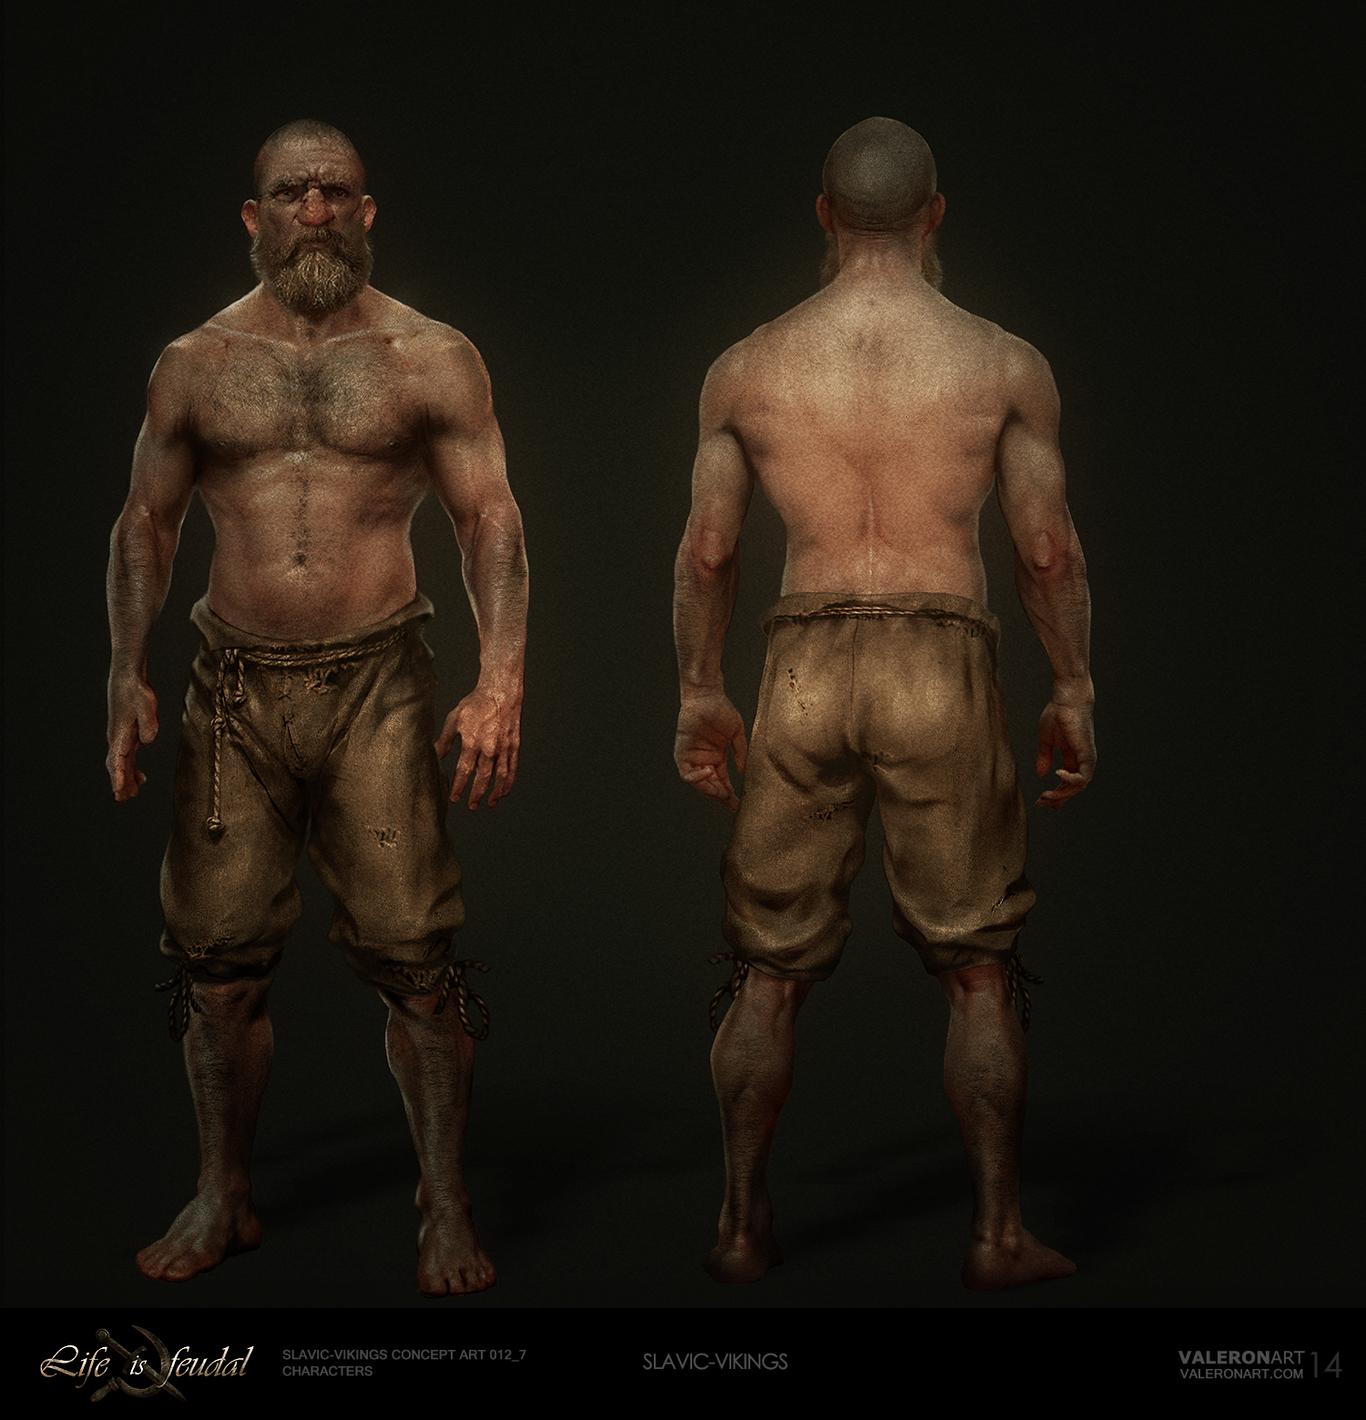 Life is feudal - Slavic-Vikings